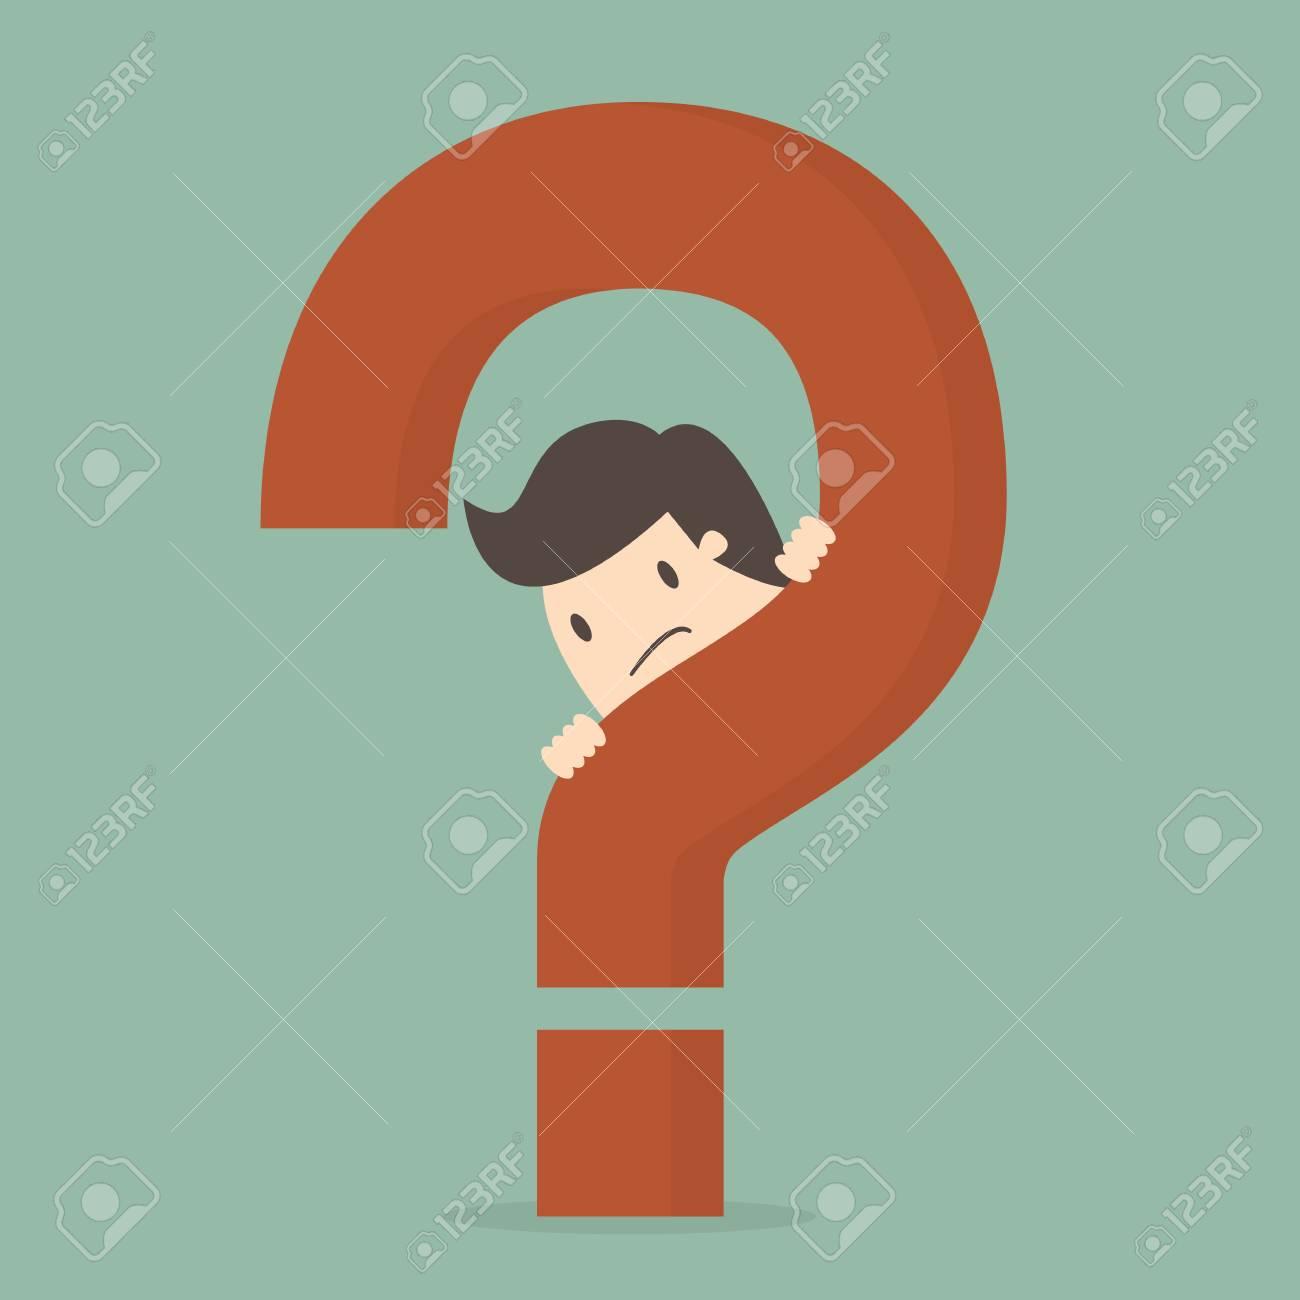 Businessman behind a question mark illustration - 96747648